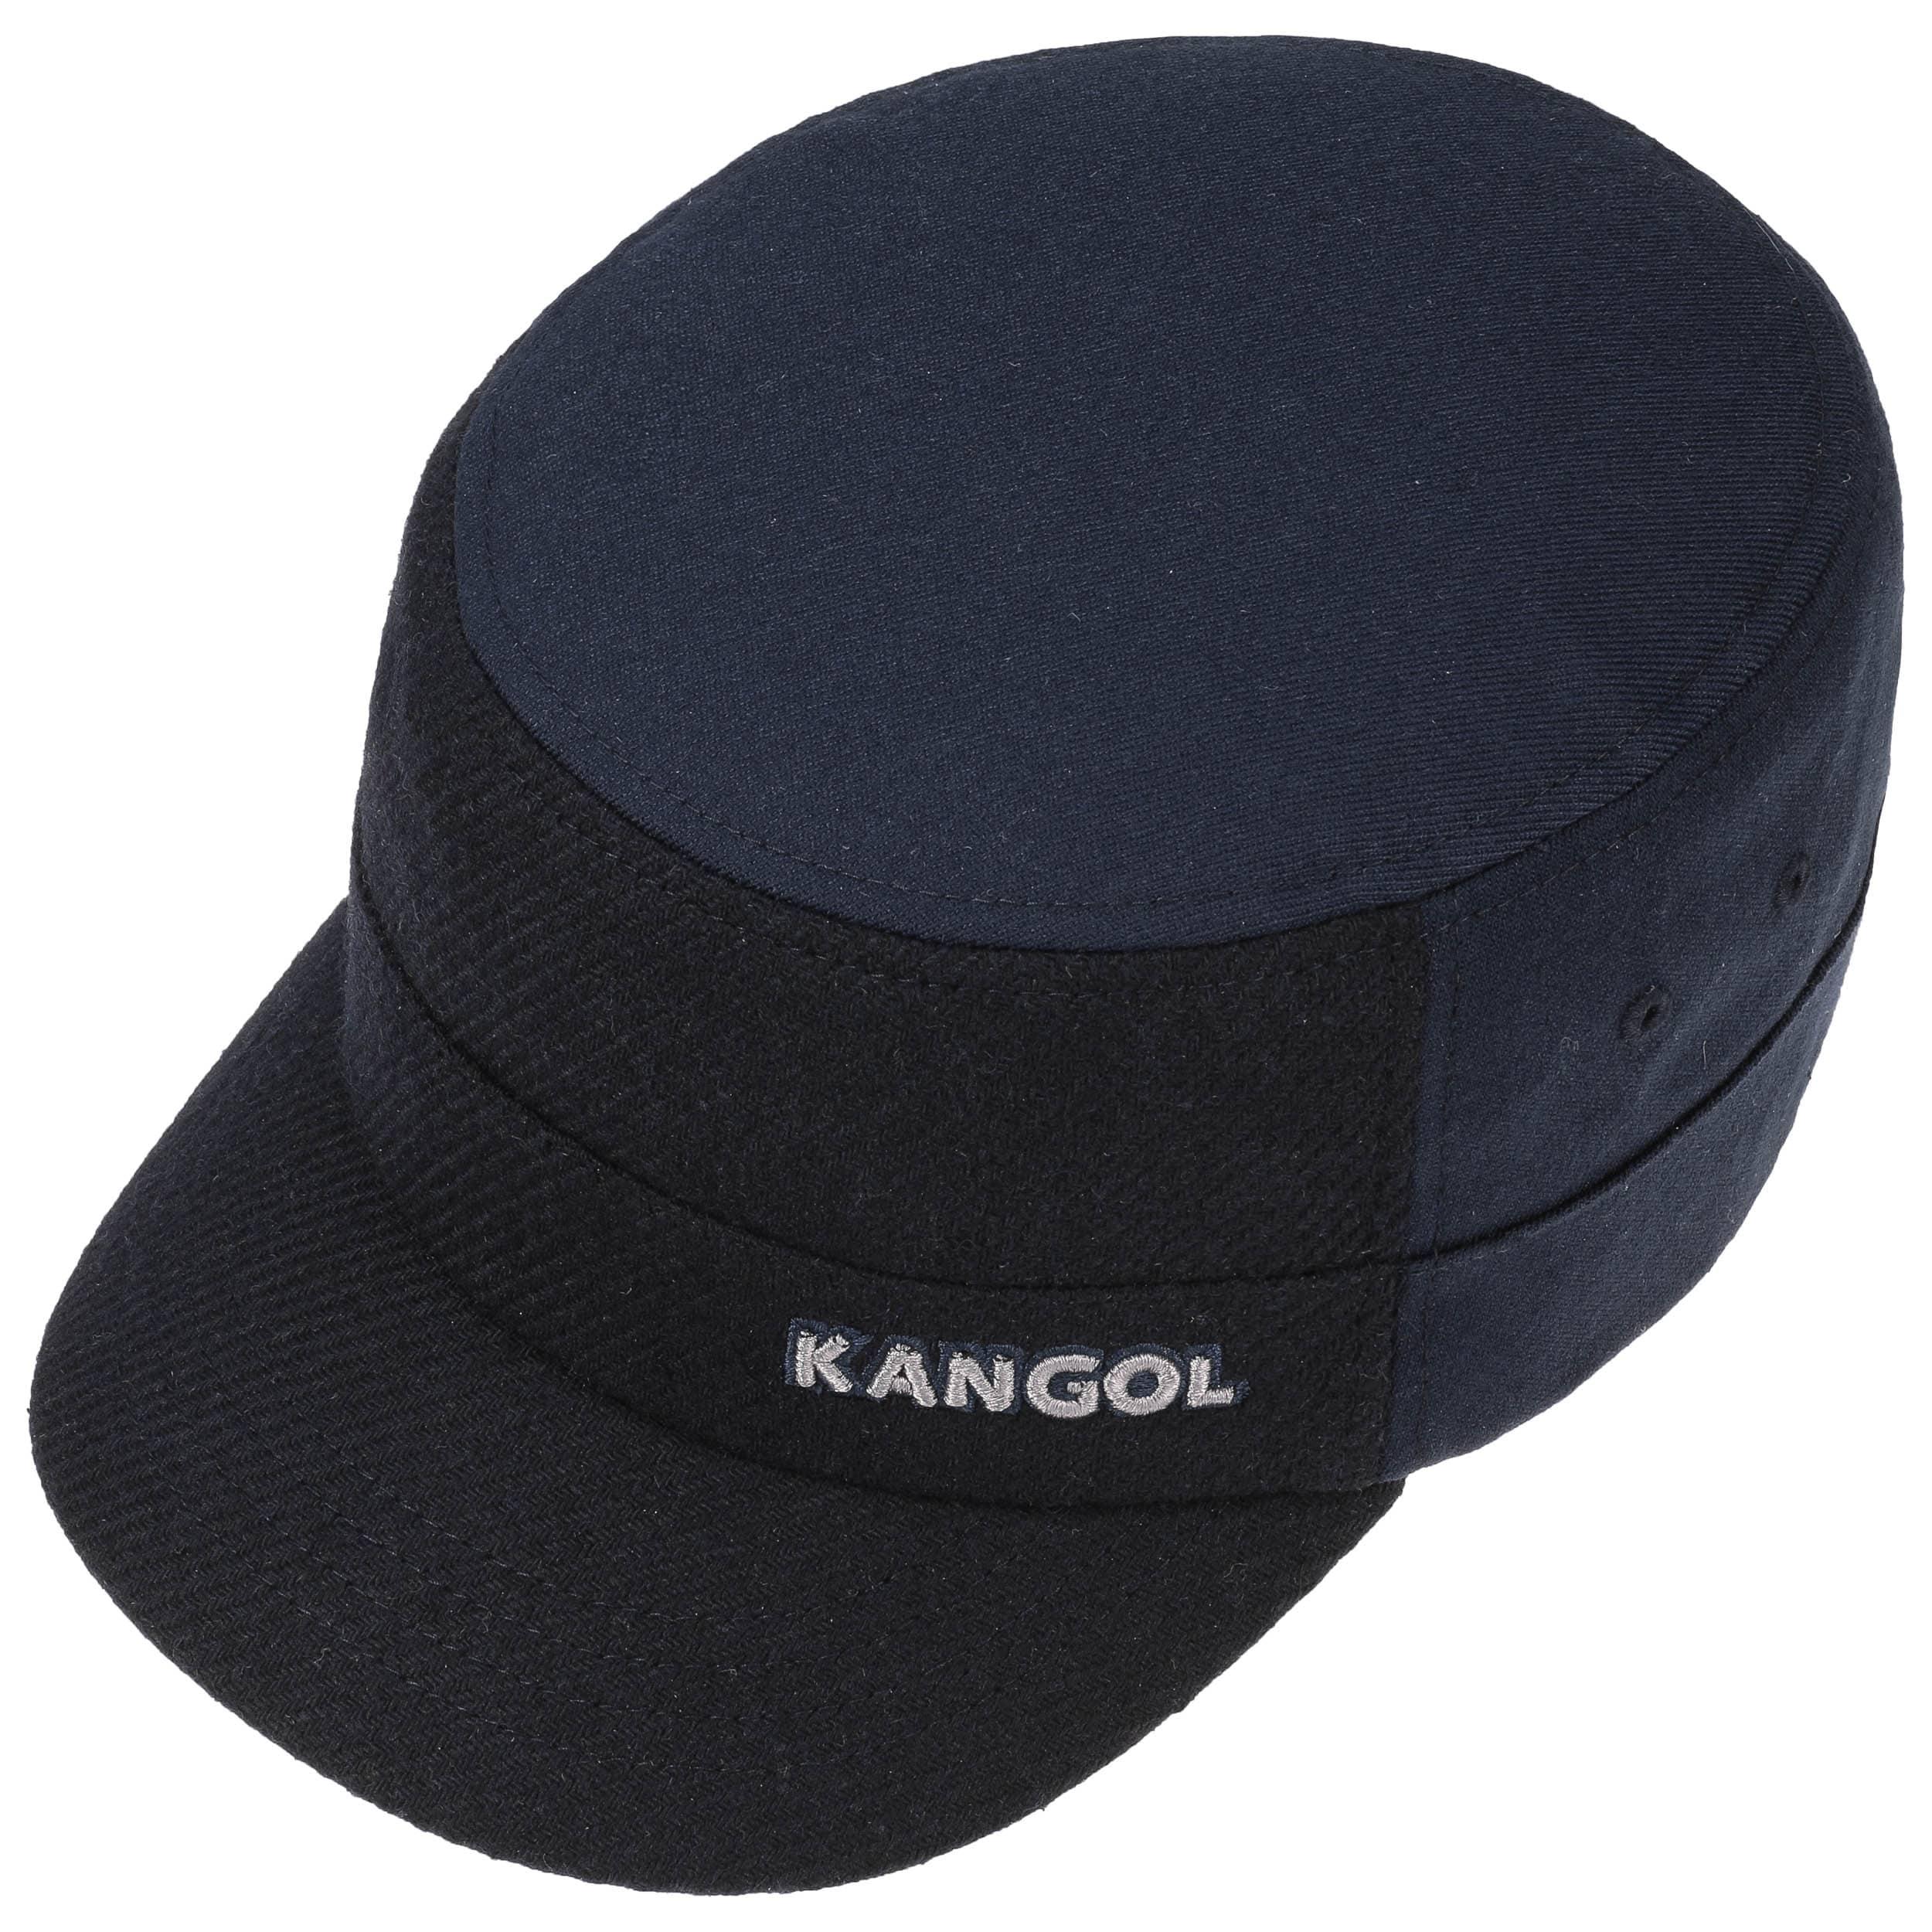 kangol textured flexfit army cap eur 4295 gt hats caps